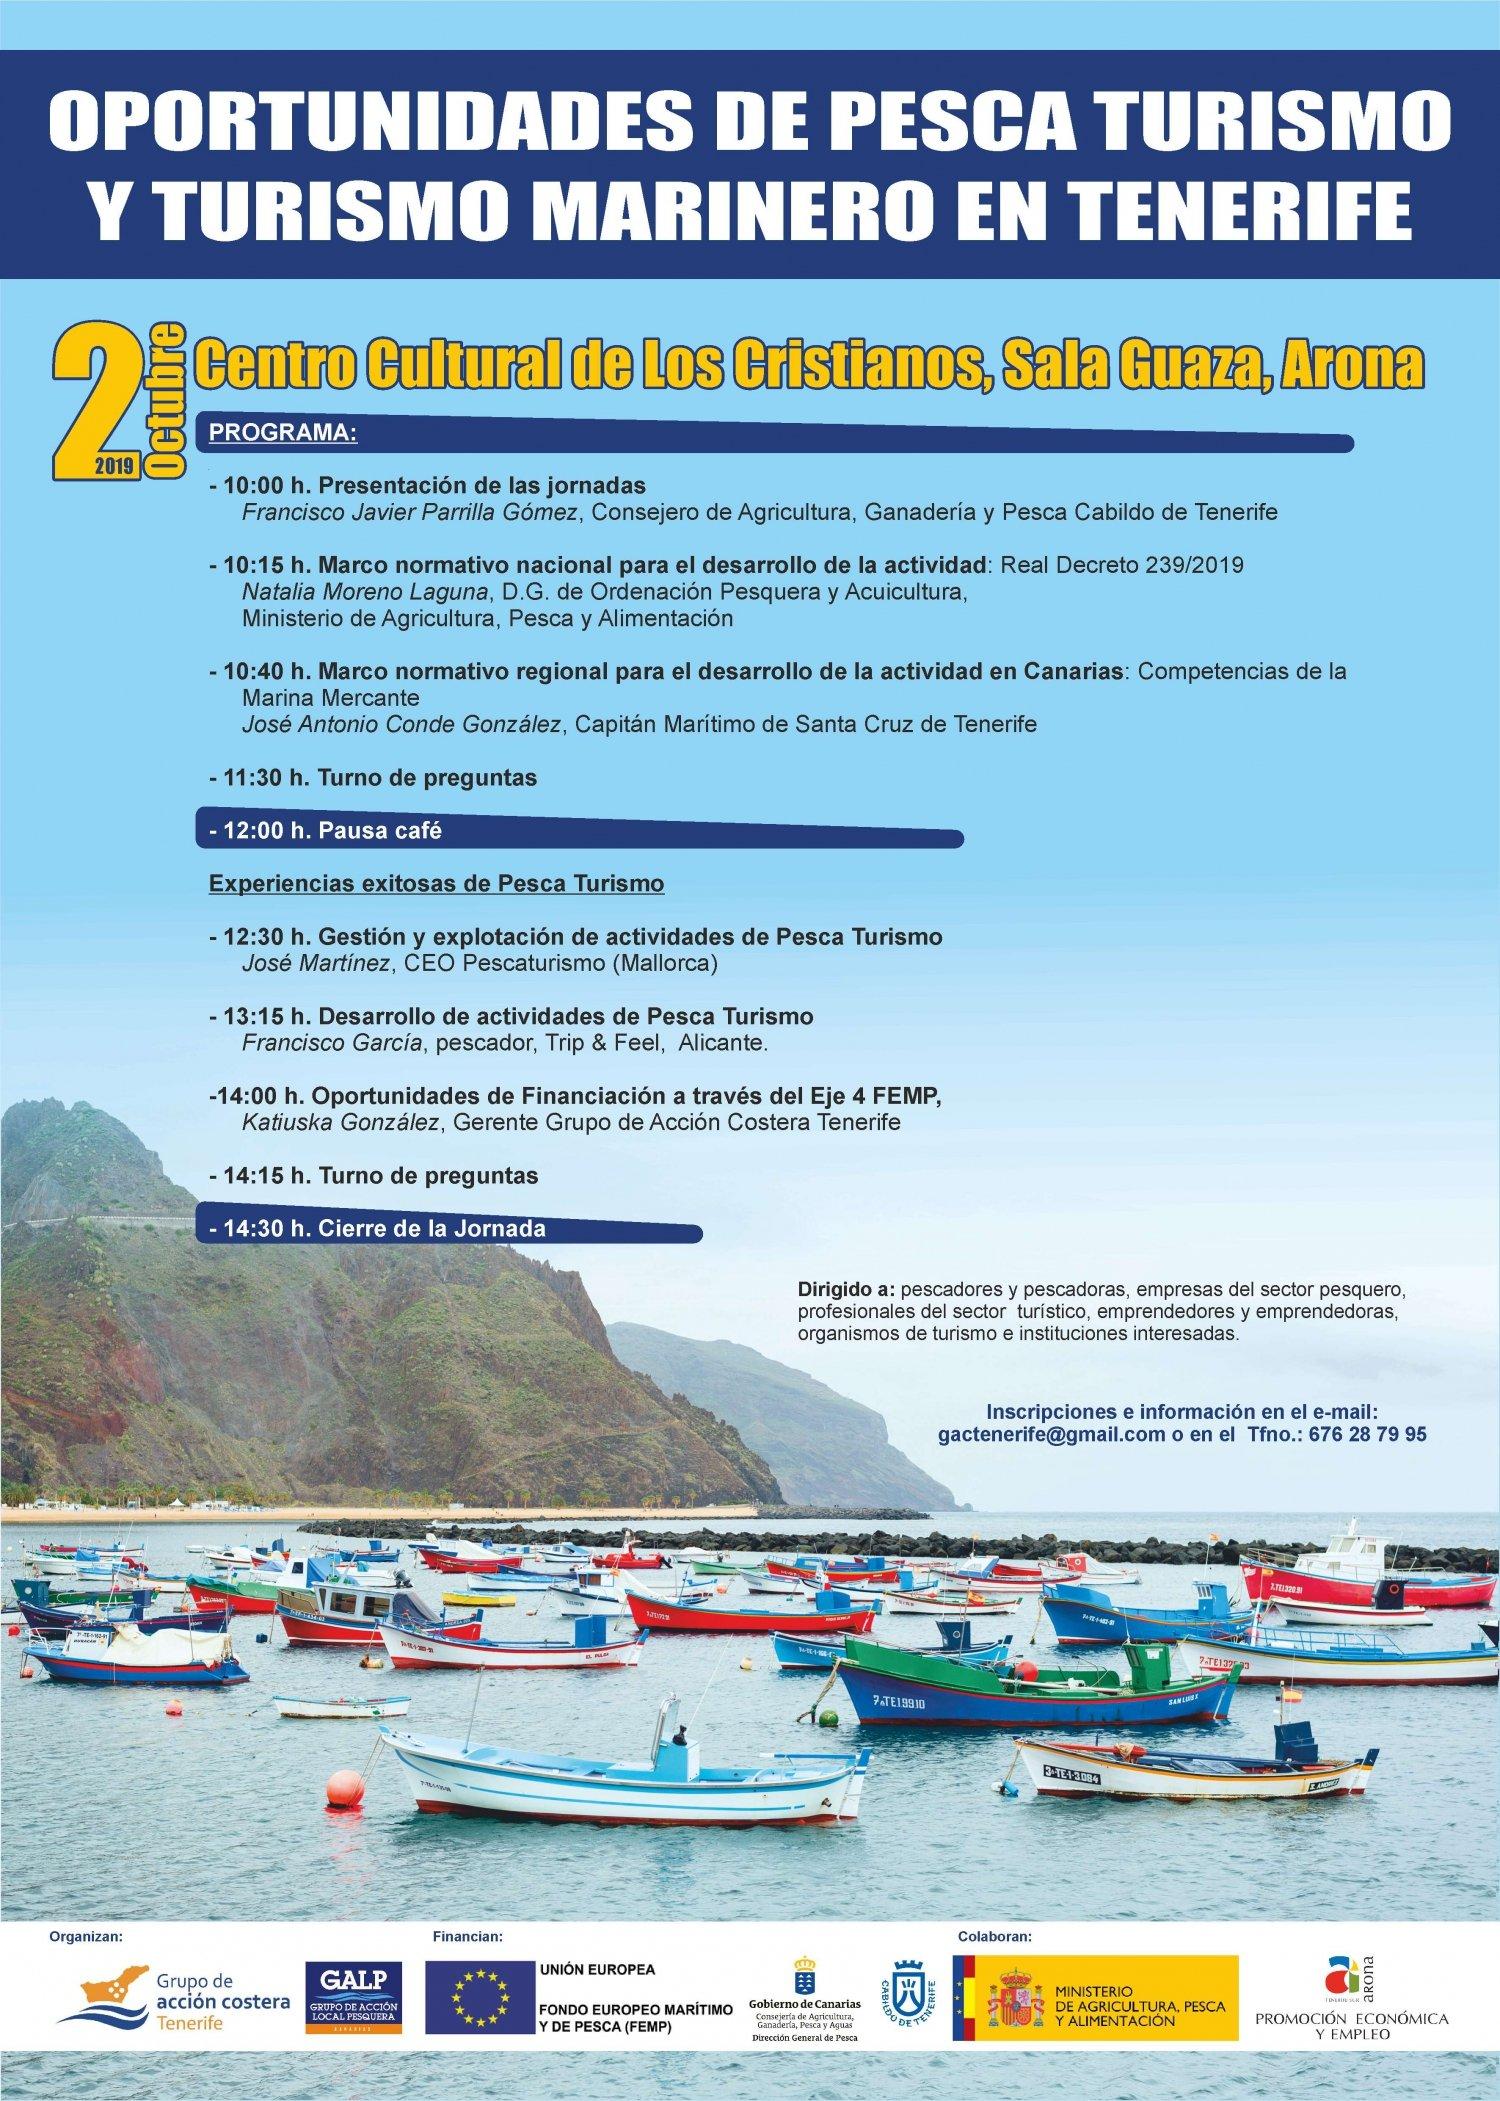 Fishing and Marine Tourism Day